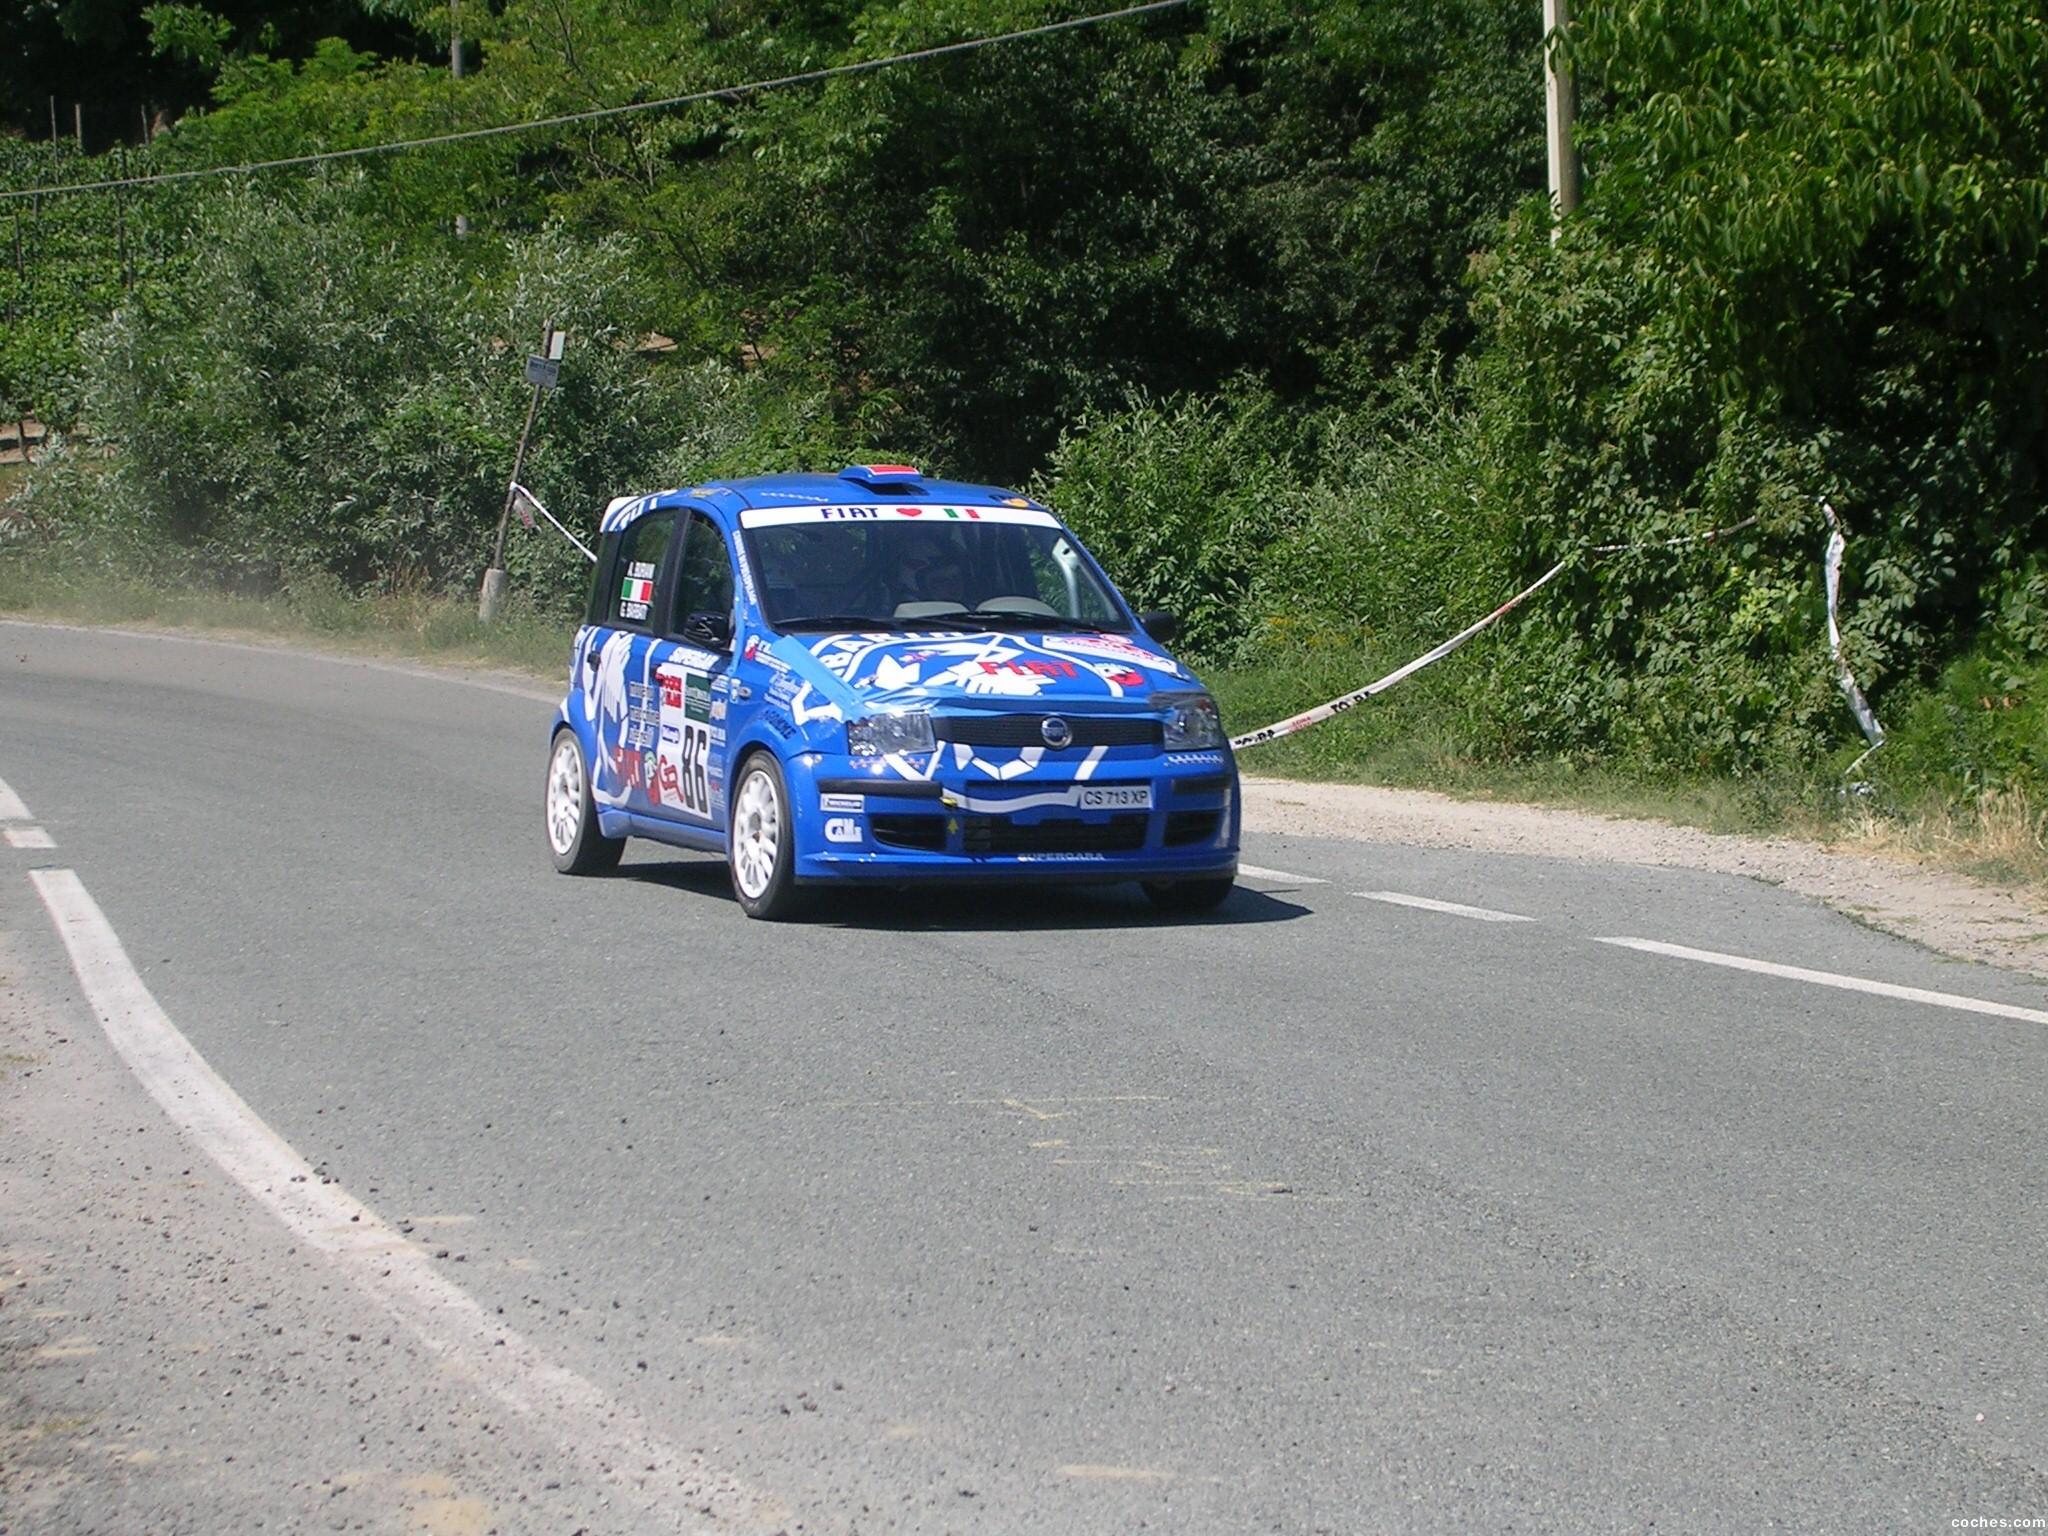 Foto 2 de Fiat Panda Rally 2005